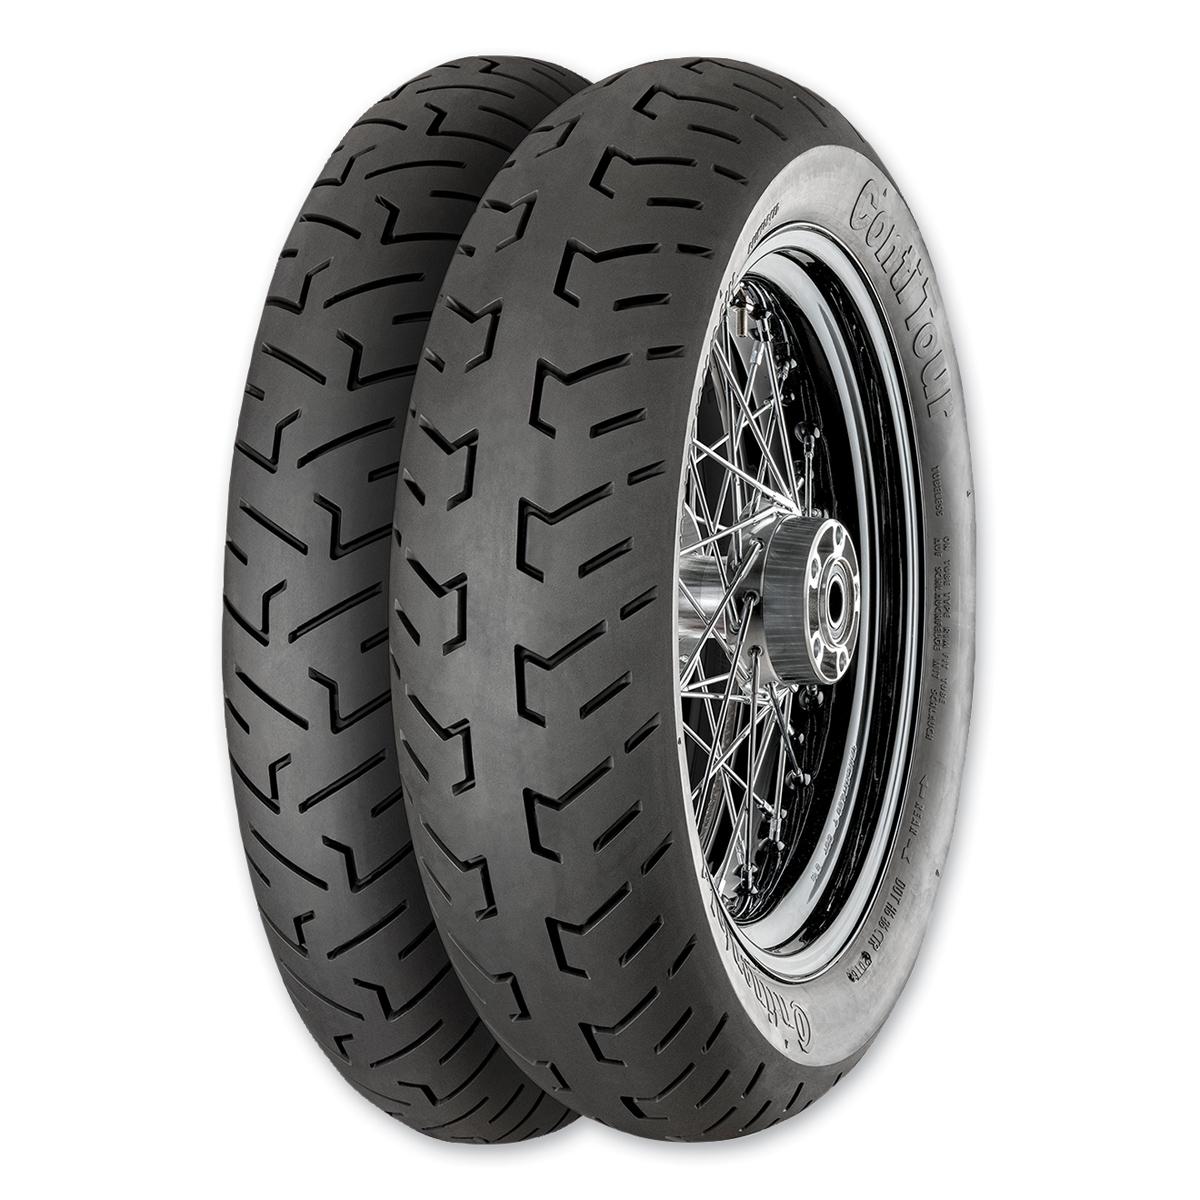 Continental Tour MT90B16 Front Tire